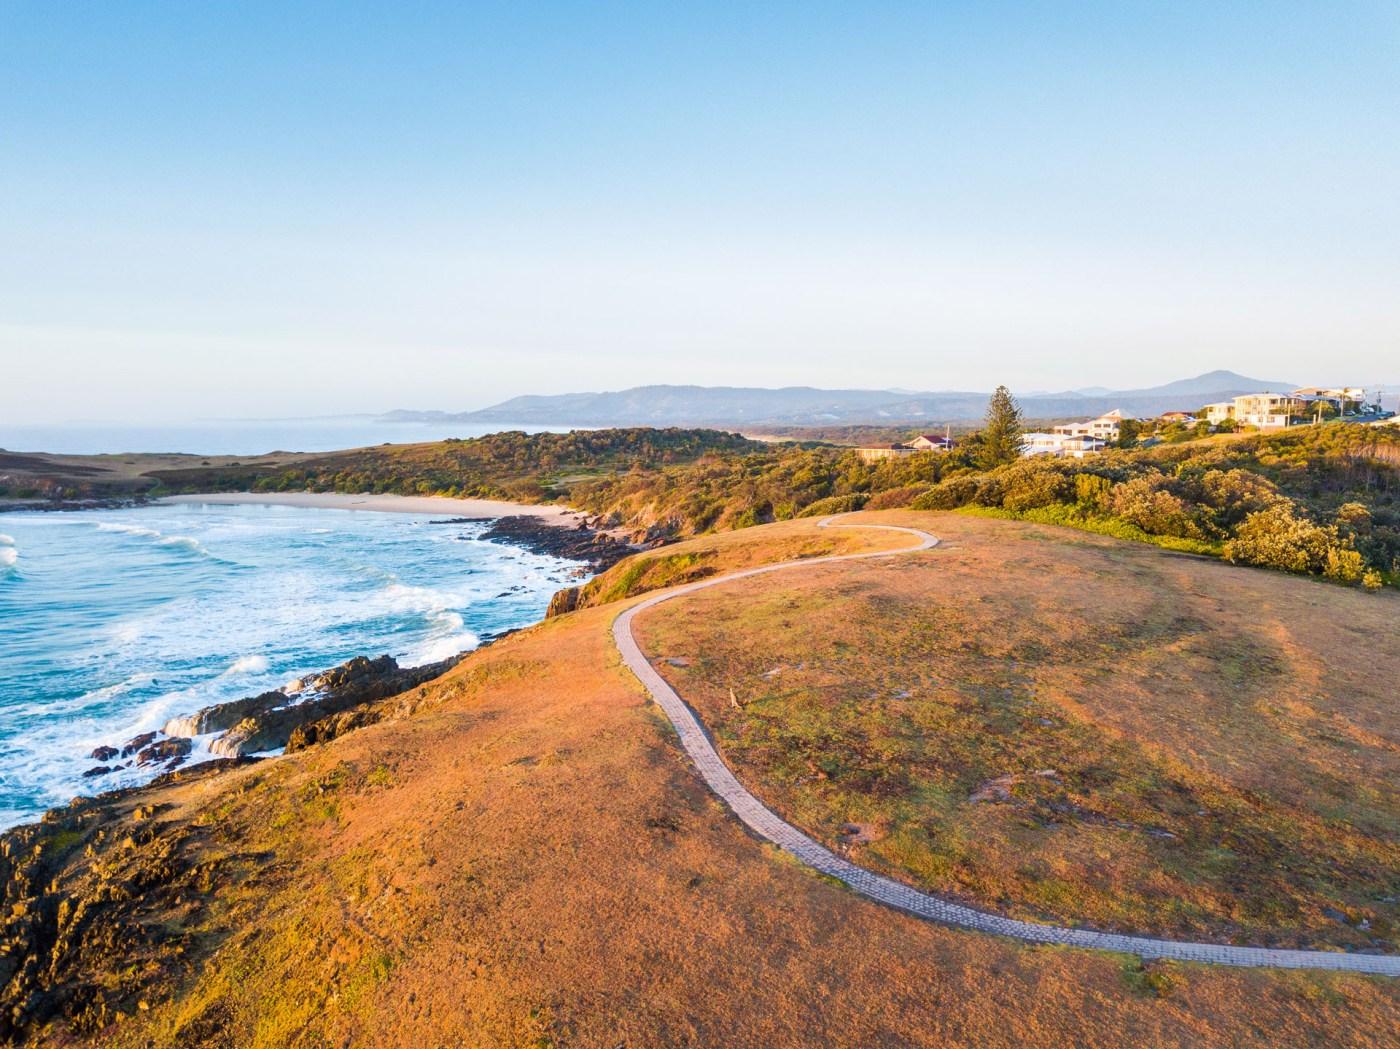 Emerald Beach, Look at me now headland - Franzi Photography